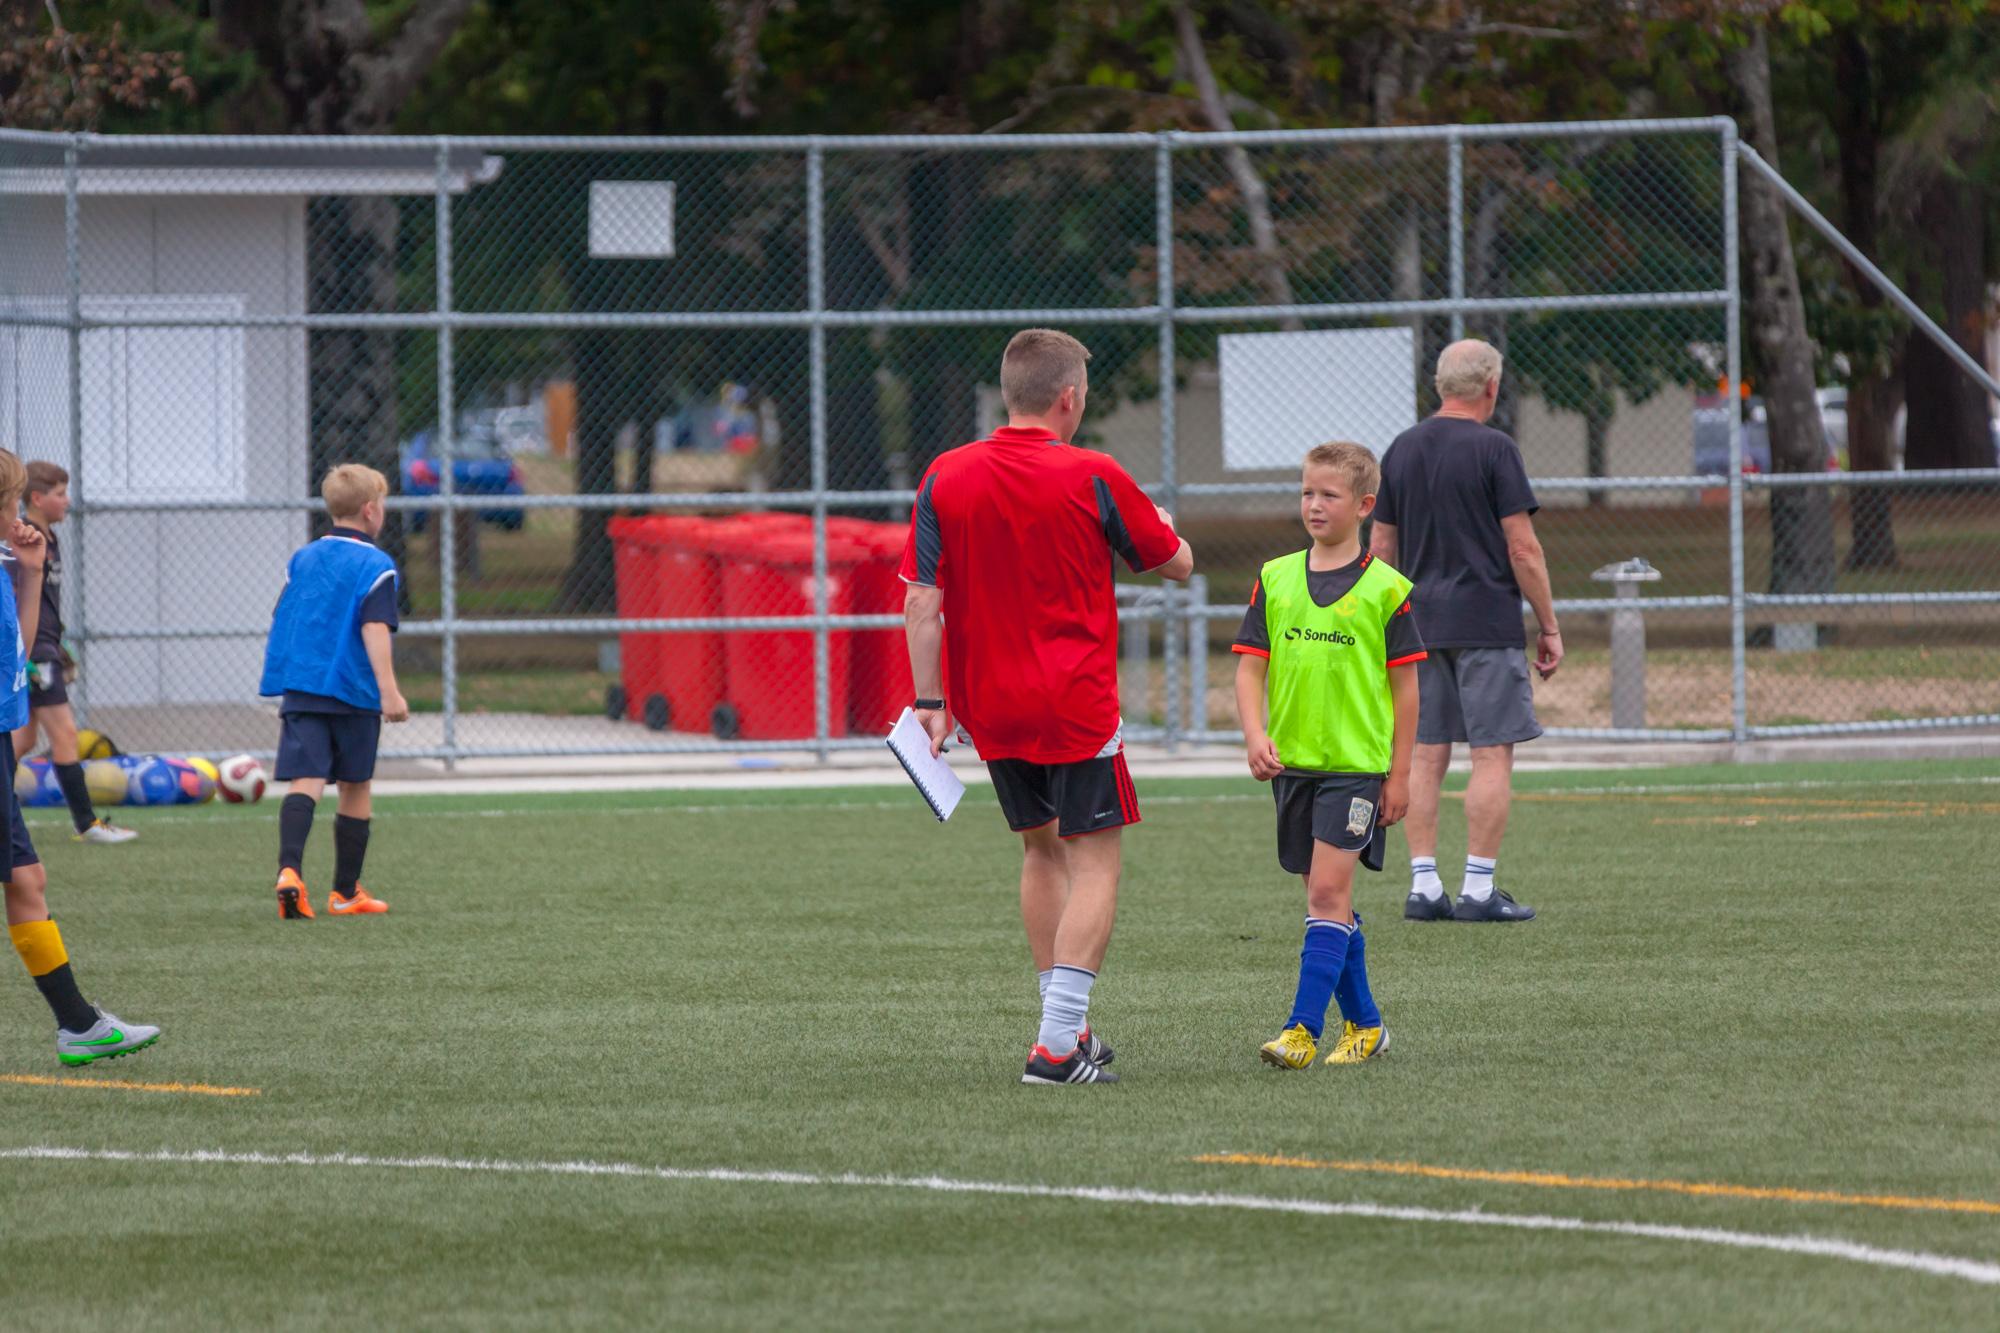 UHCC Soccer Coach 4431